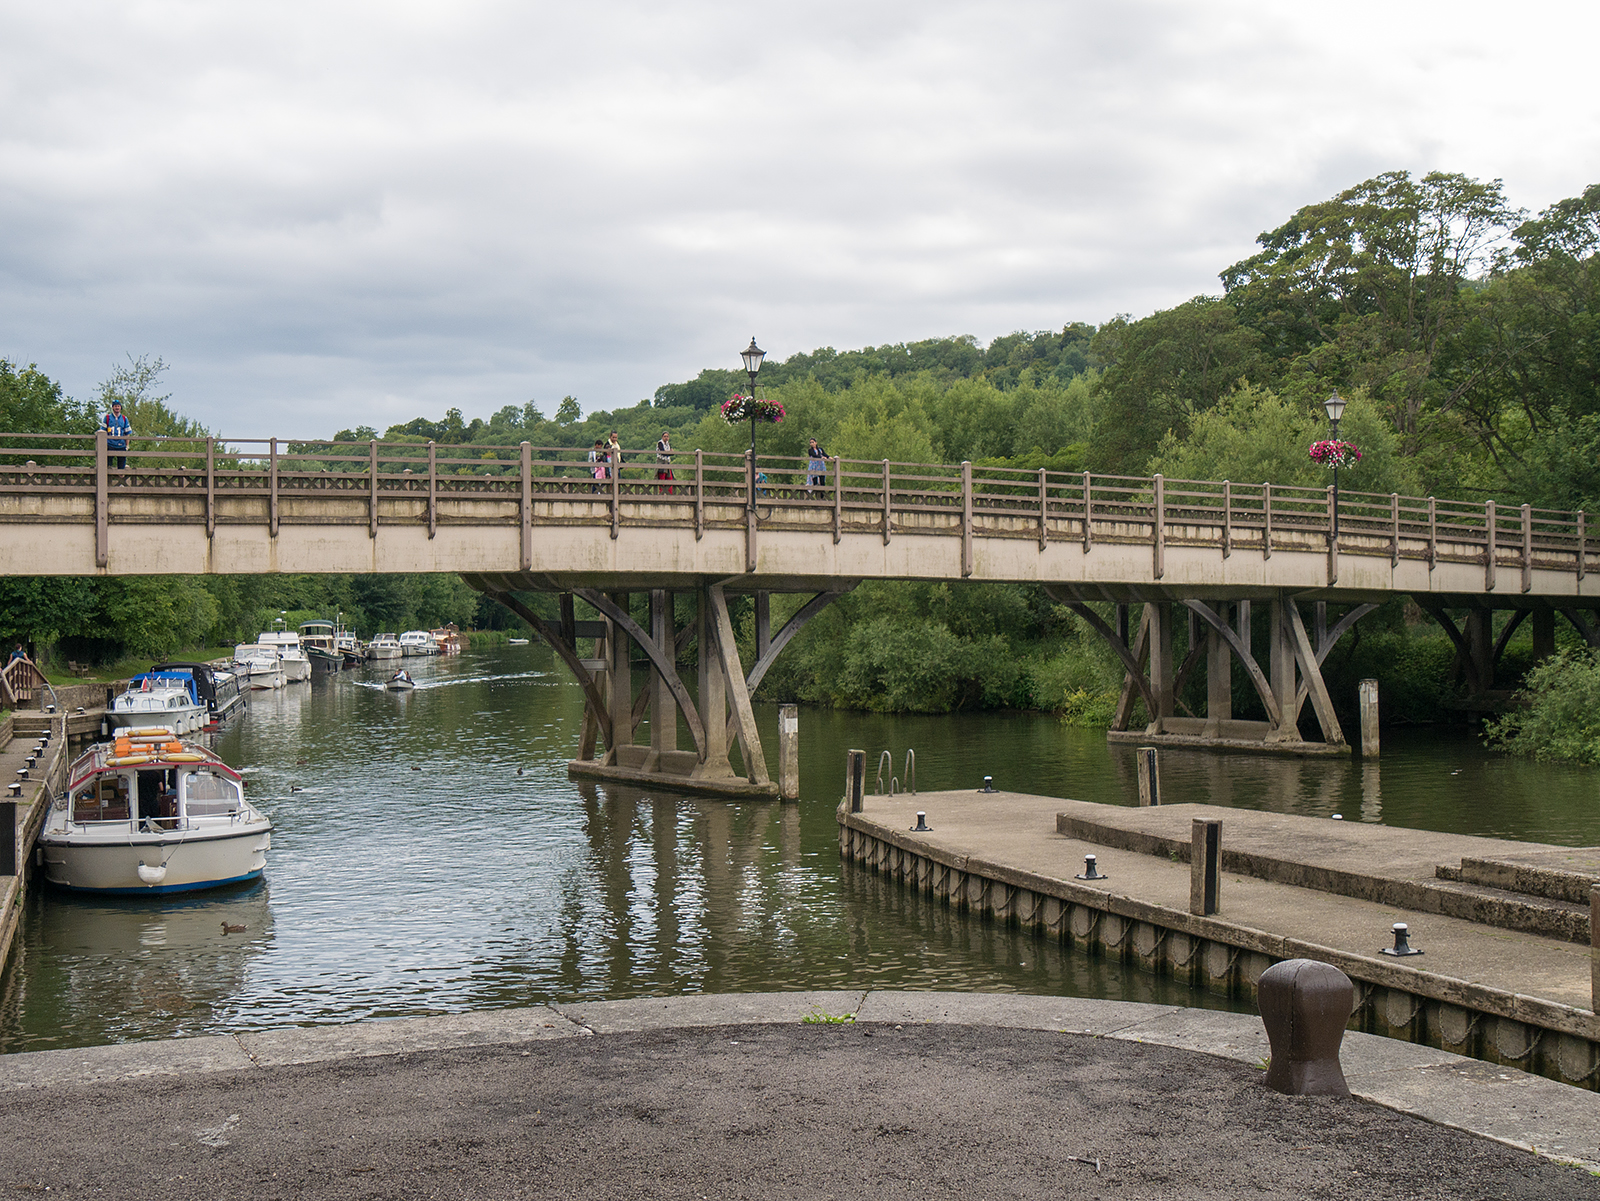 Goring bridge (looking back from the lock)